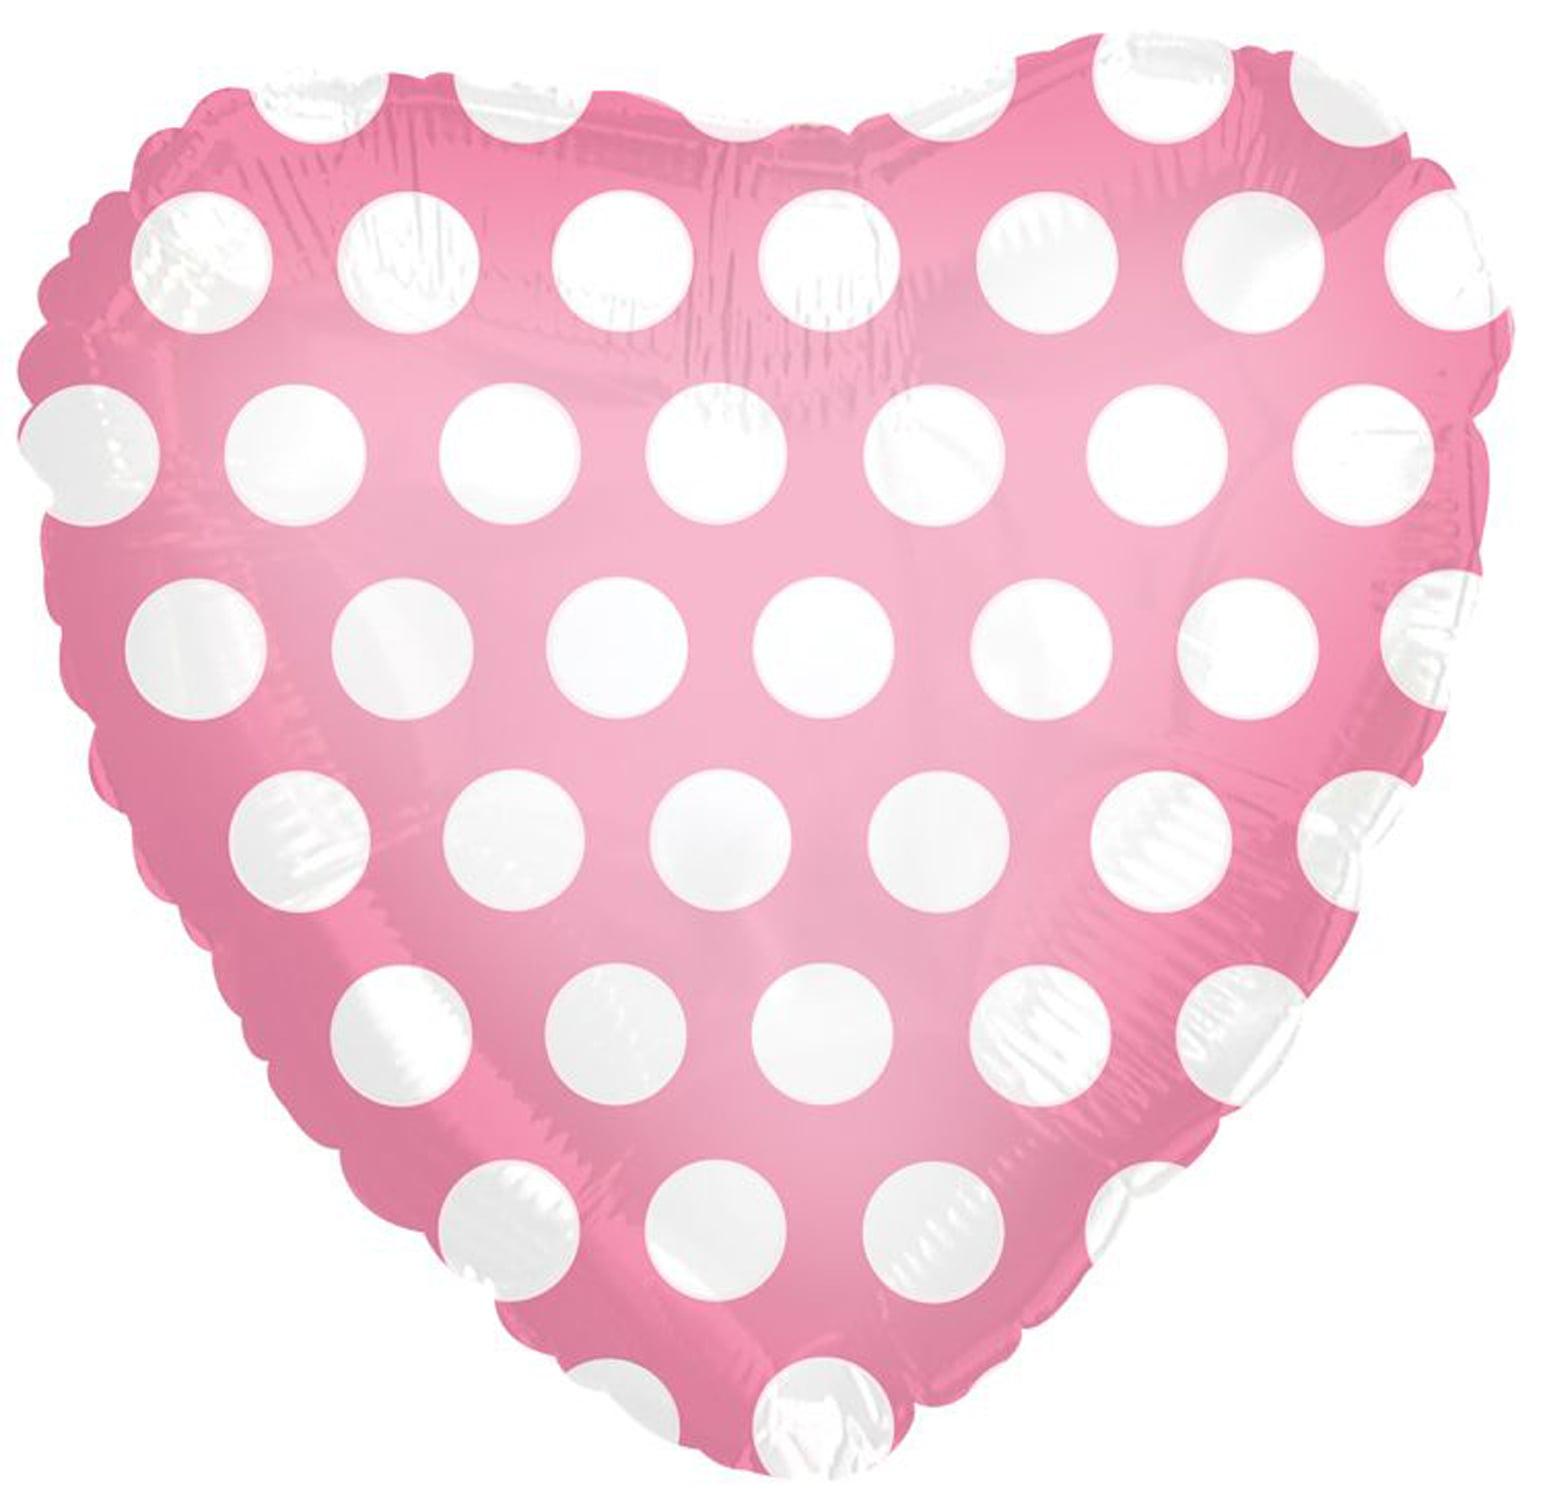 CTI Polka Dot Heart Shaped Valentine 18' Foil Balloon, Pink White